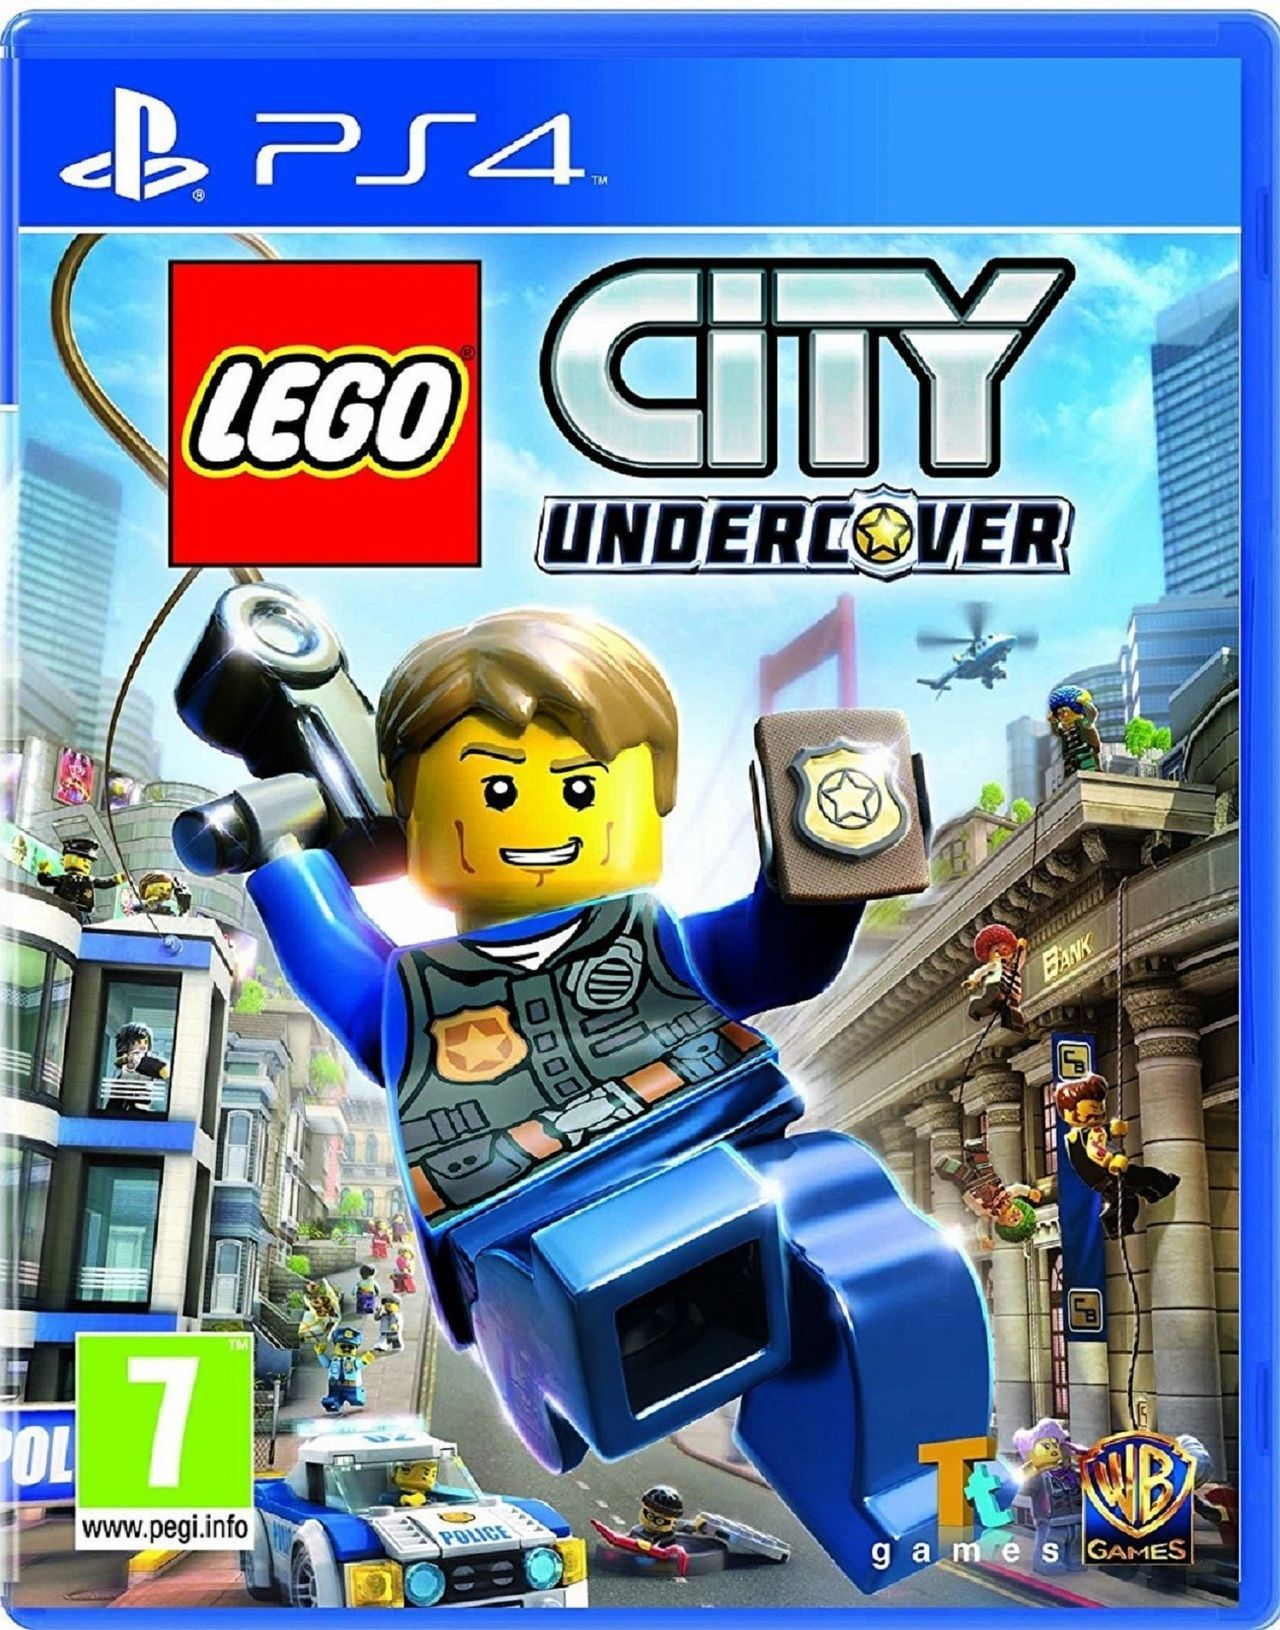 Lego City Undercover Toda La Informacion Ps4 Wii U Switch Pc